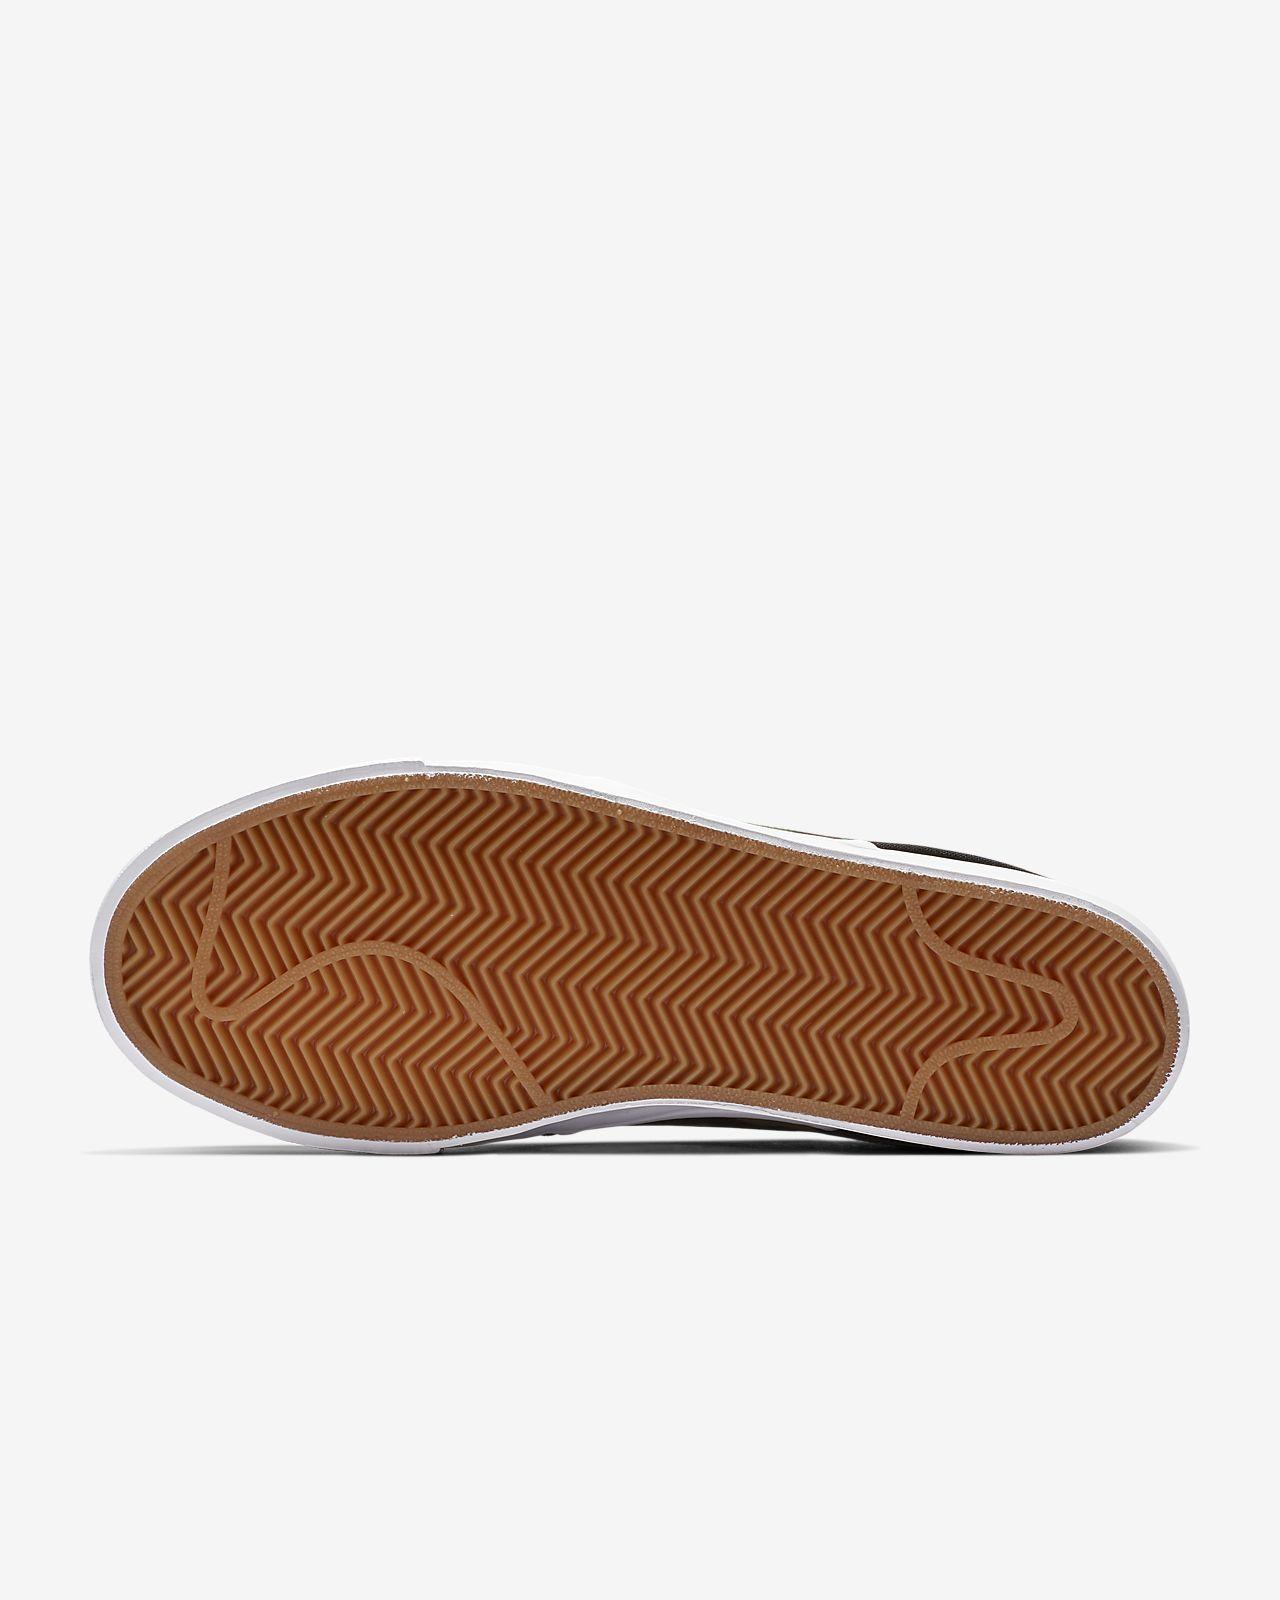 sneakers for cheap 7ead7 4d8d4 ... Nike SB Zoom Stefan Janoski Canvas Mens Skate Shoe